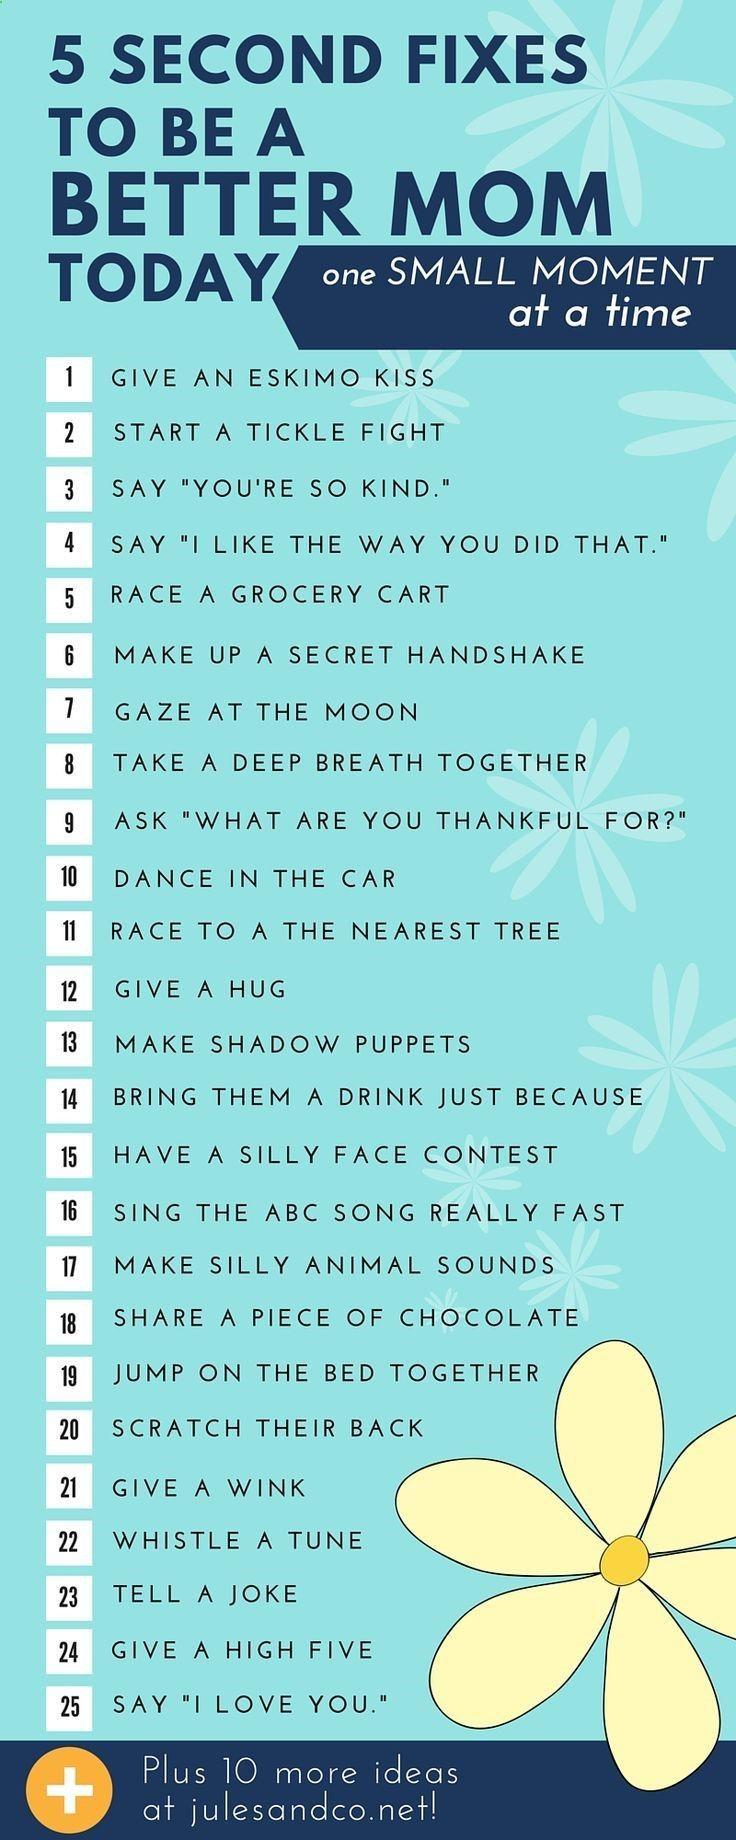 47 best Parenting images on Pinterest | Child discipline, Parenting ...